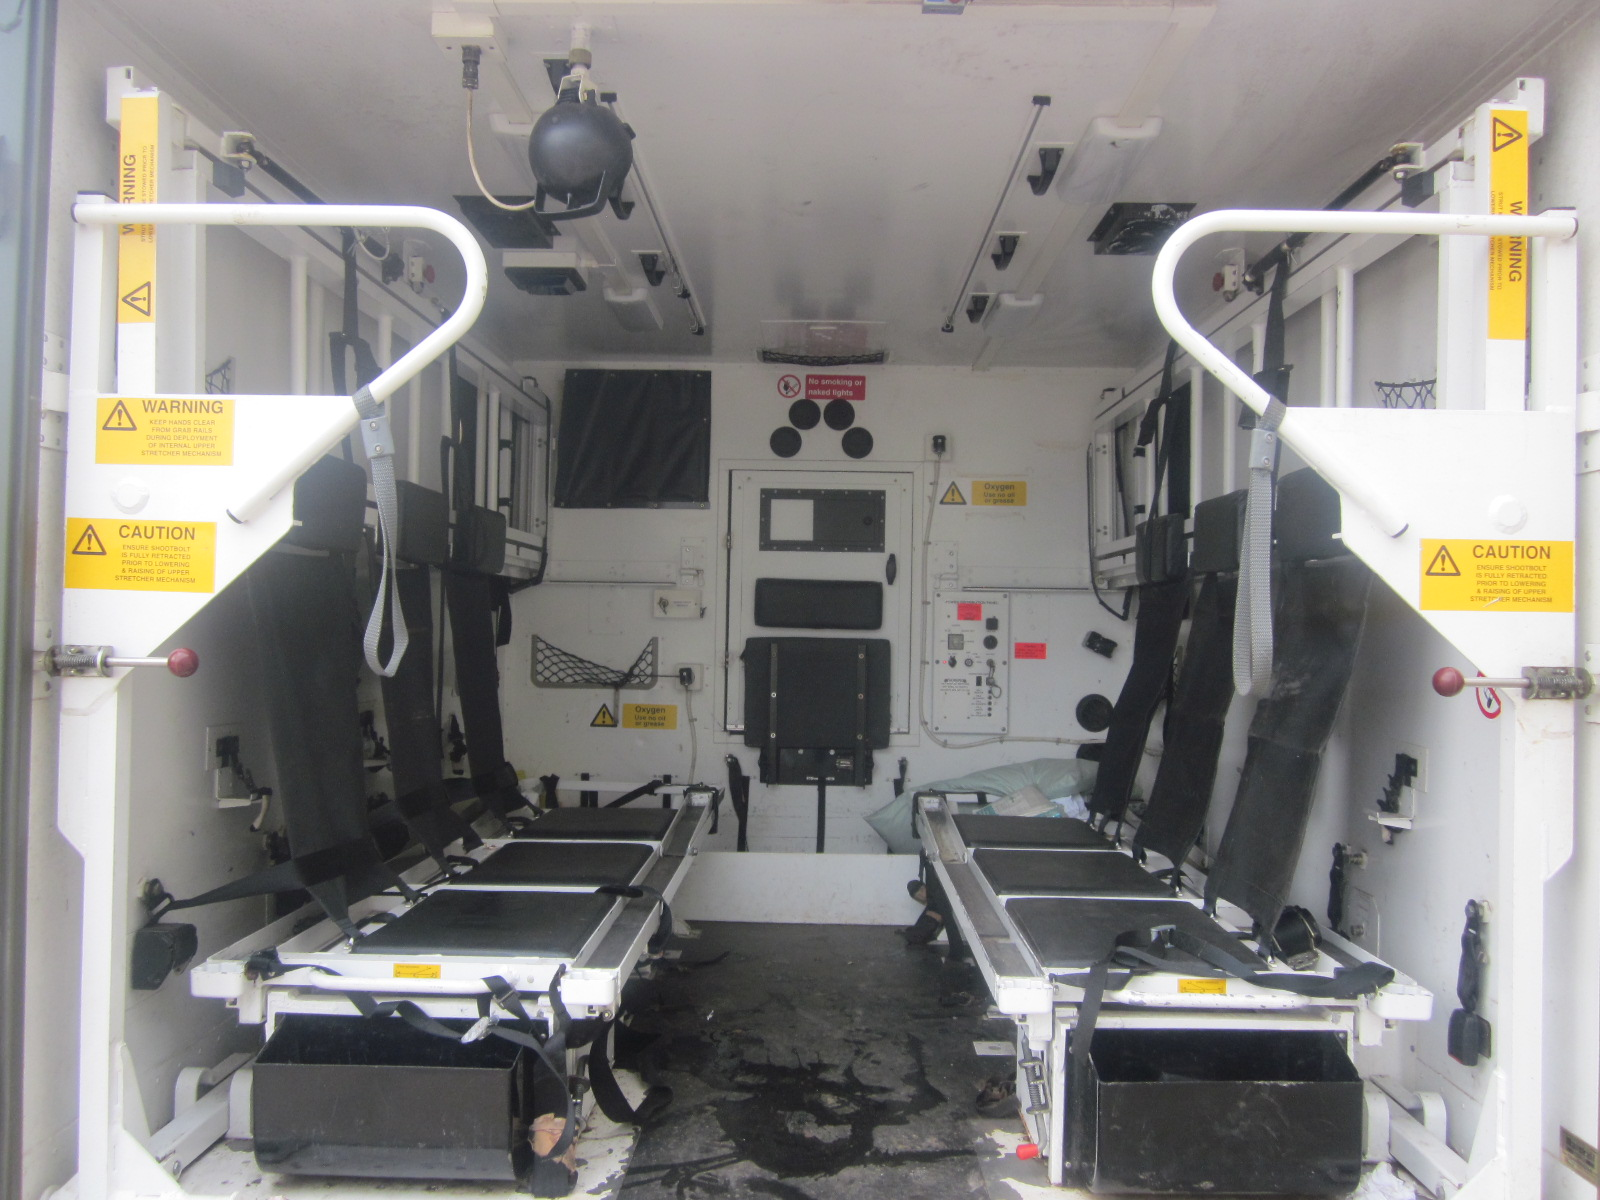 Mercedes Unimog U1300L turbo 4x4  Ambulance   RHD for sale